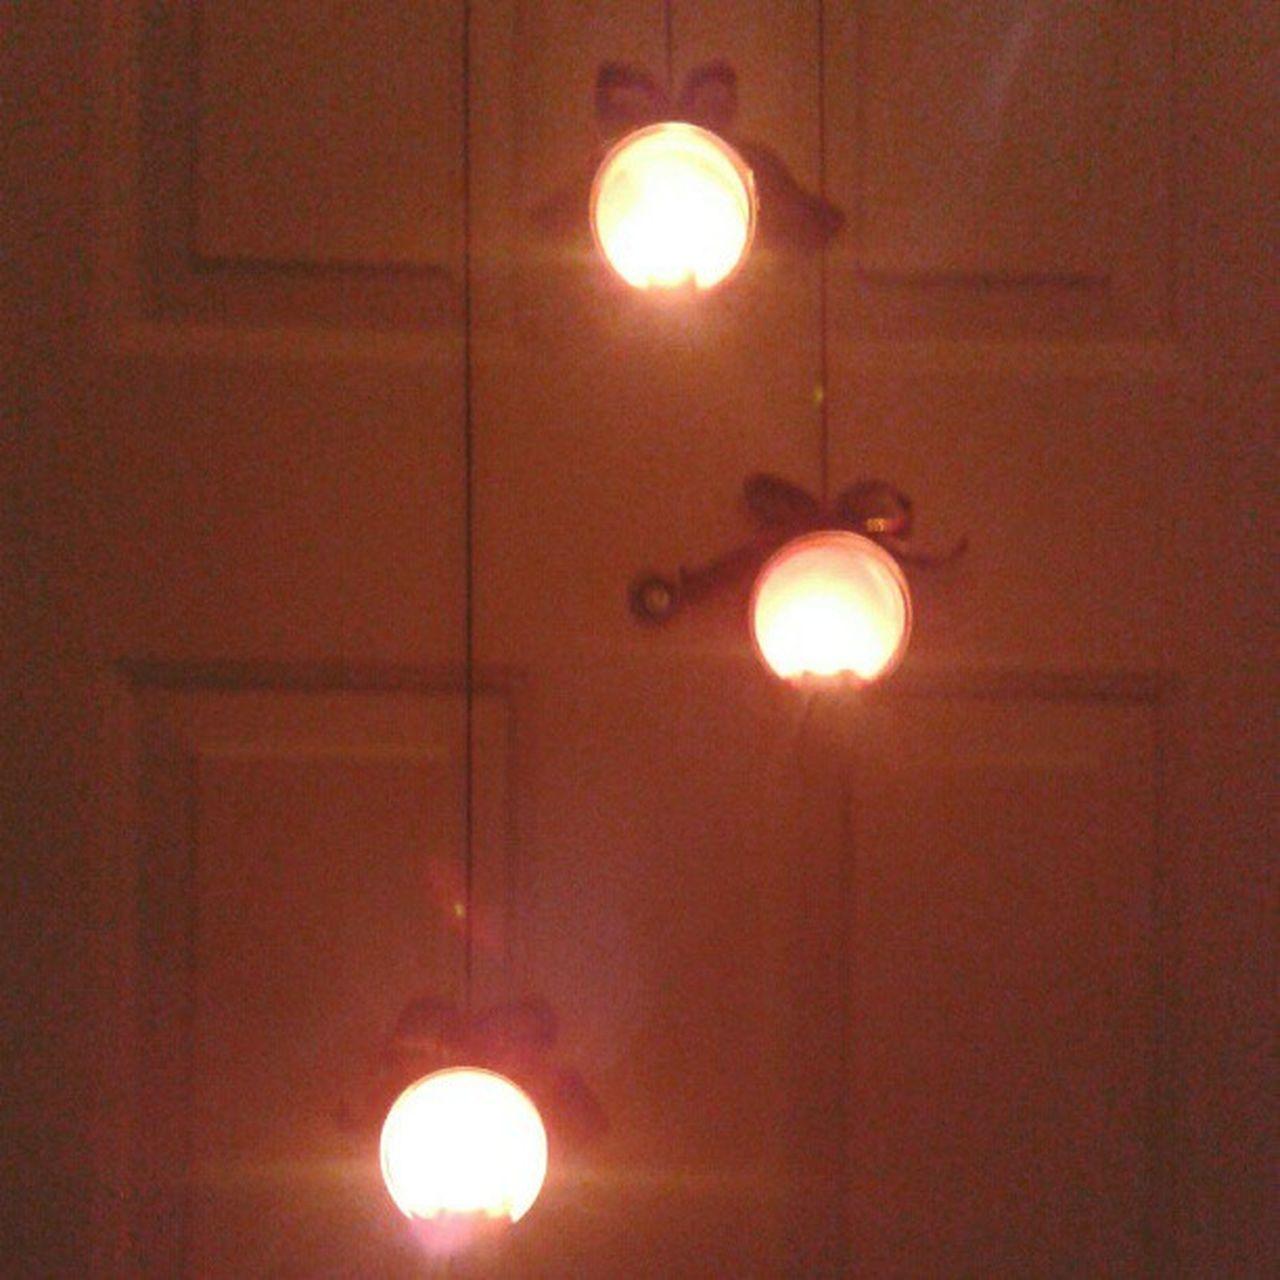 Noche de velitas! Empezo navidad.... Lights Nightofcandles Yearning Christmas Wishes Luz Velas Deseos